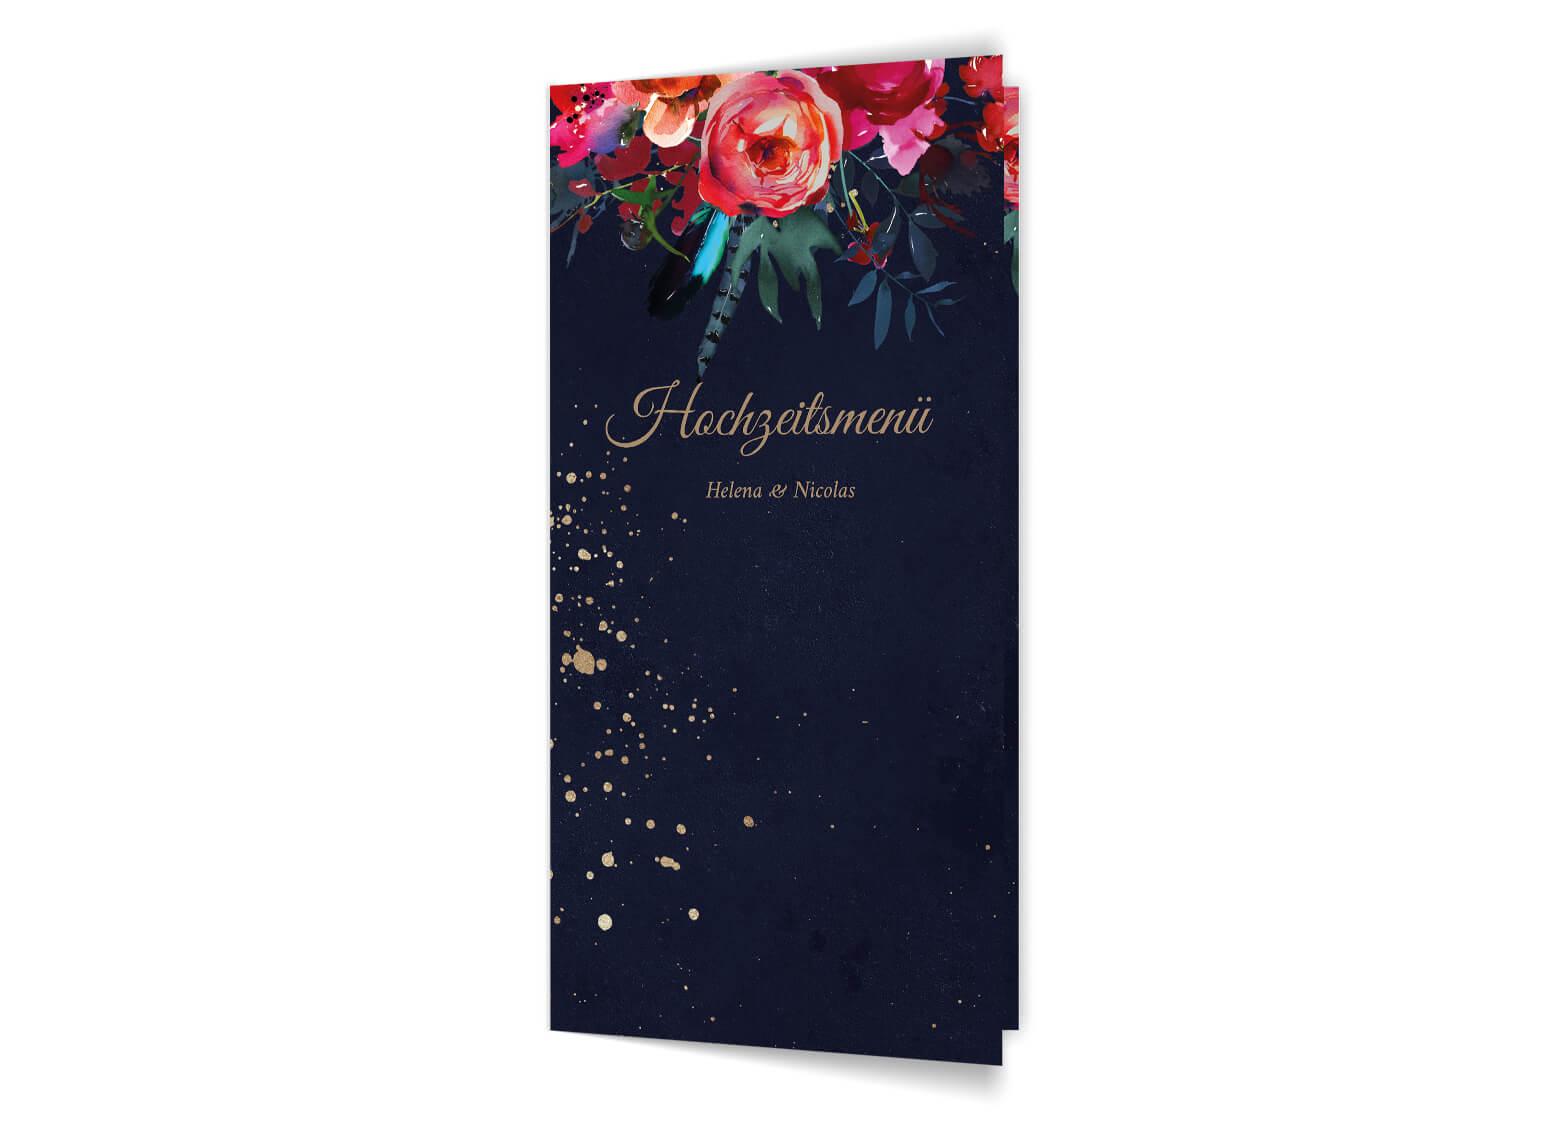 hochzeit-menue-klappkarte-din-lang–dunkel-blau-beerentoene-blumen-aquarell-gold-front-MP0021-5.0.2